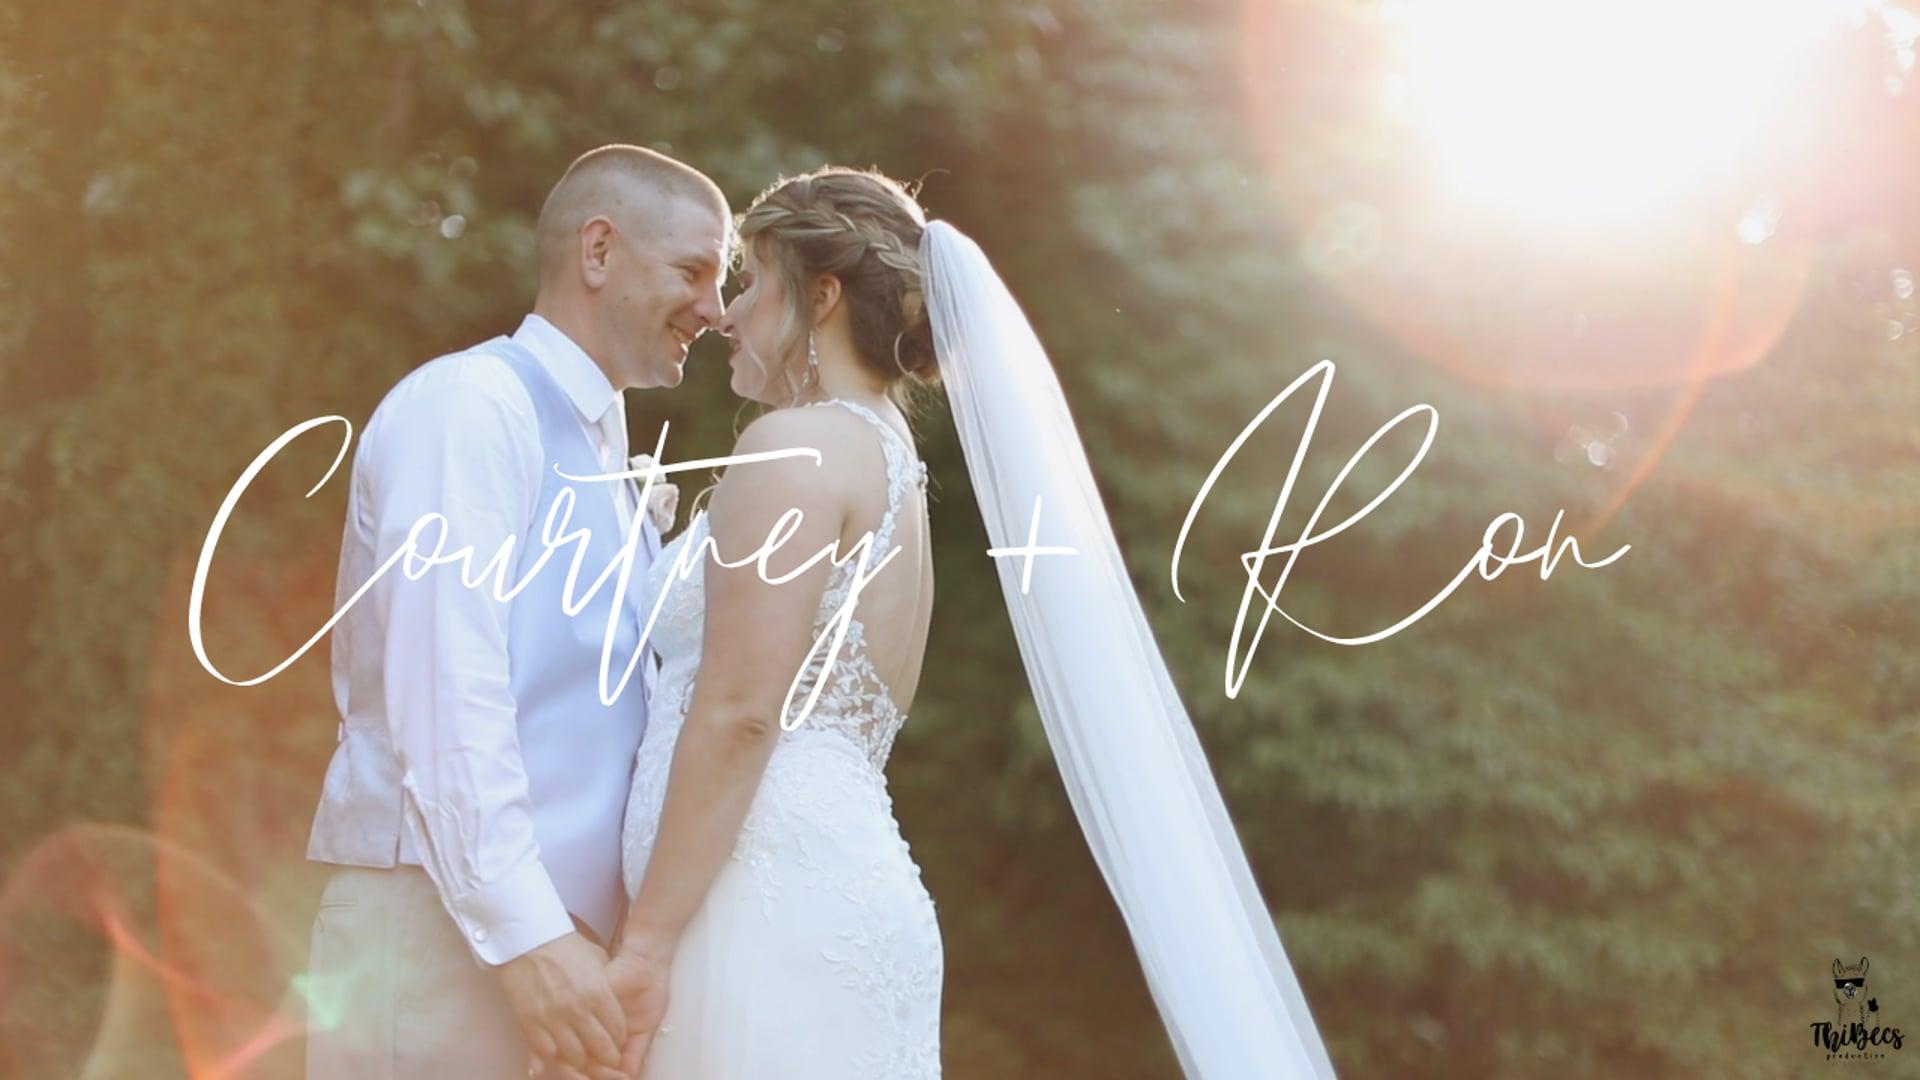 Courtney & Ron  | Wedding Video | Lenexa,VA